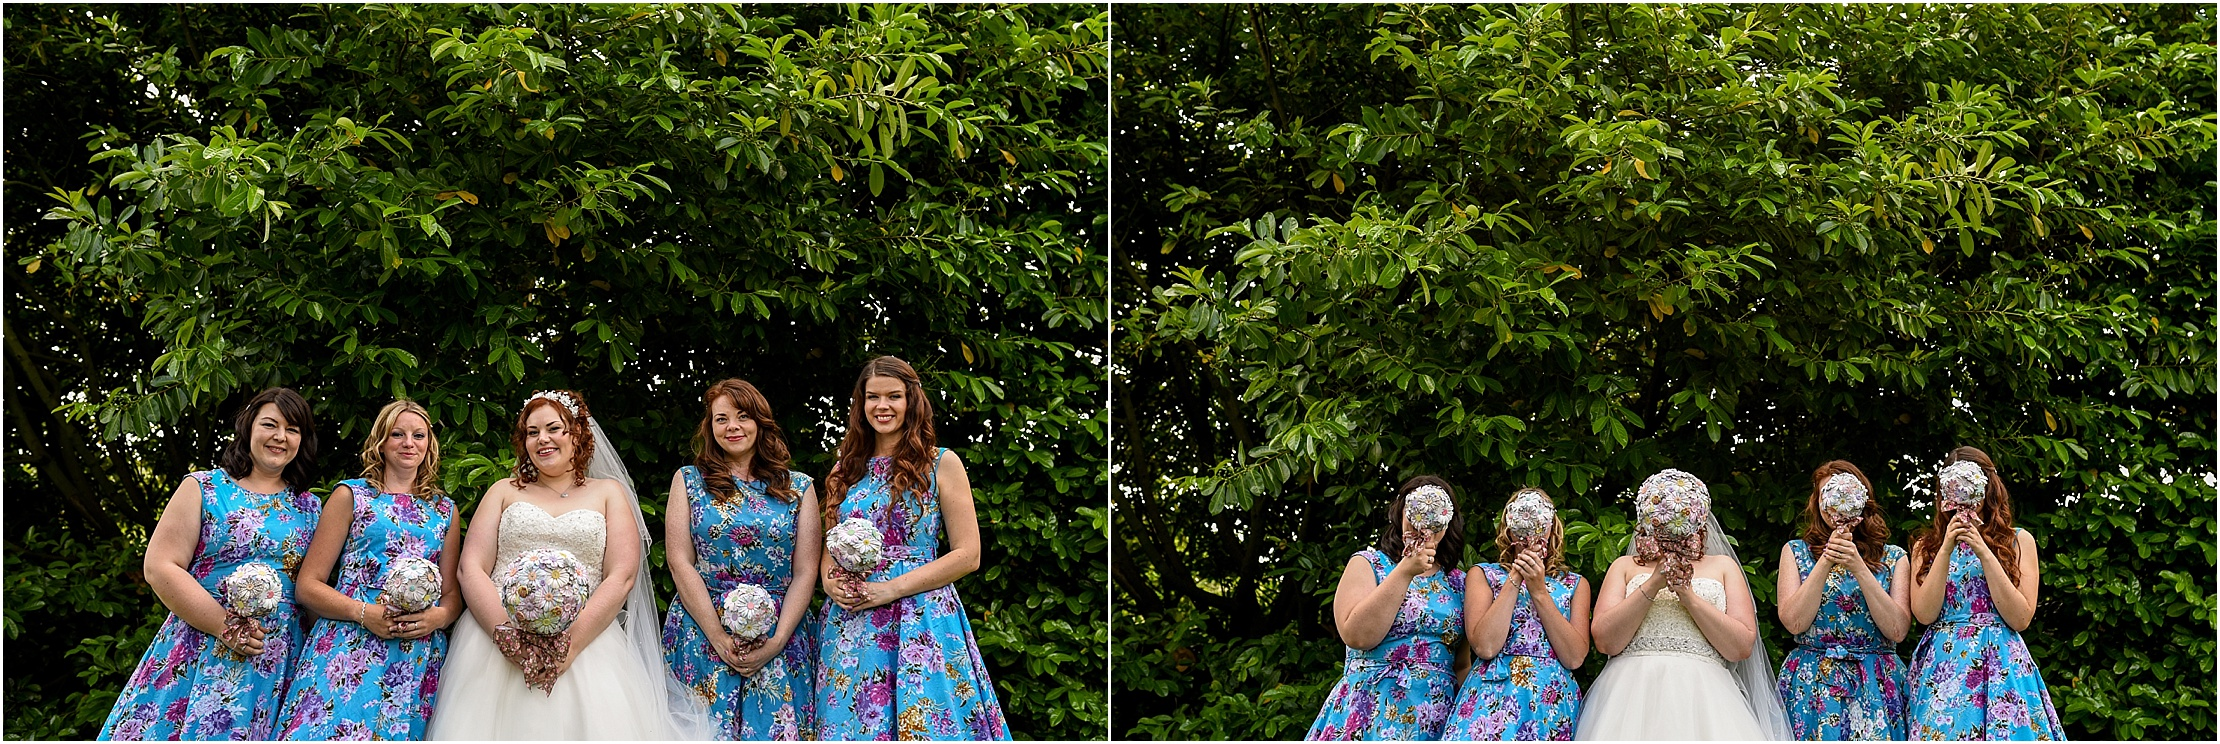 shireburn-arms-wedding- 085.jpg